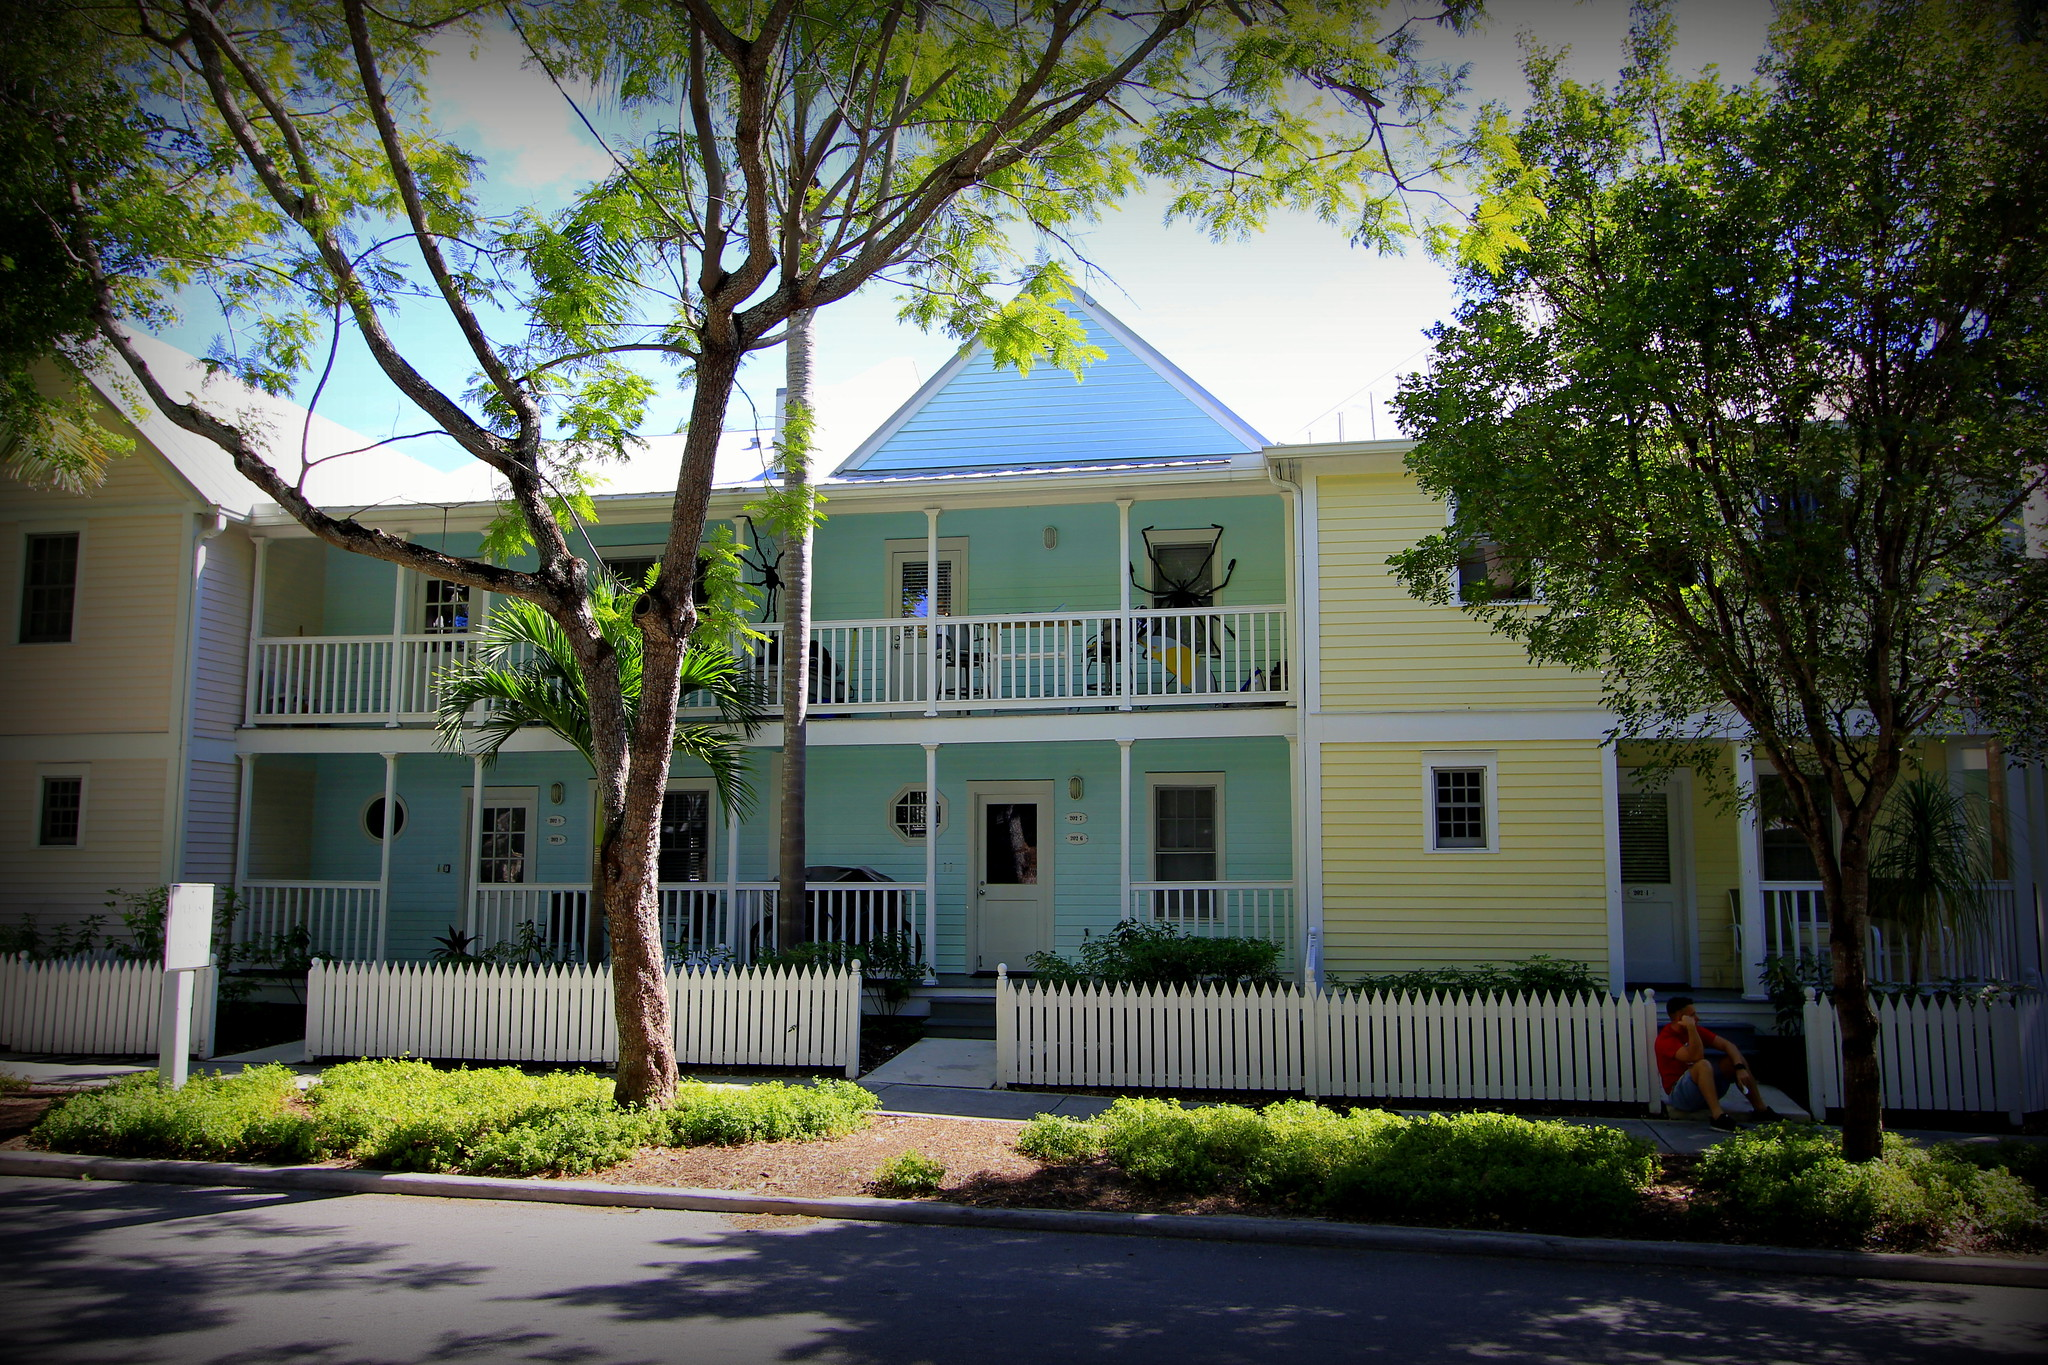 Key West Properties 202 Southard St 6 Transient Licensed Shipyard Condominium Key West